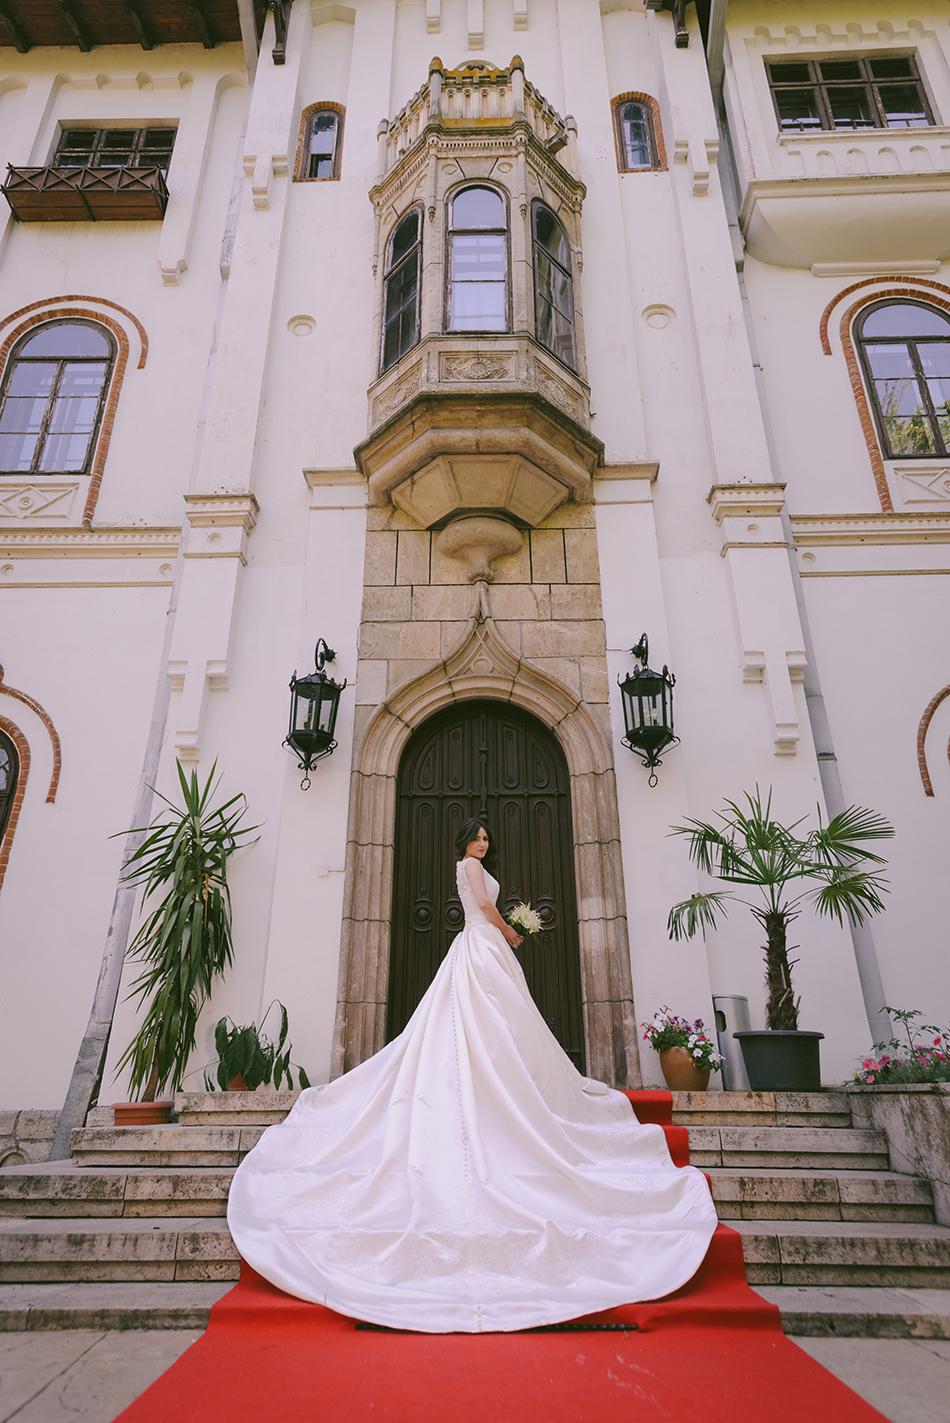 AD Passion Photography | astrid-madalin-nunta-rin-grand-hotel-bucuresti-fotograf-profesionist_0055 | Adelin, Dida, fotograf profesionist, fotograf de nunta, fotografie de nunta, fotograf Timisoara, fotograf Craiova, fotograf Bucuresti, fotograf Arad, nunta Timisoara, nunta Arad, nunta Bucuresti, nunta Craiova